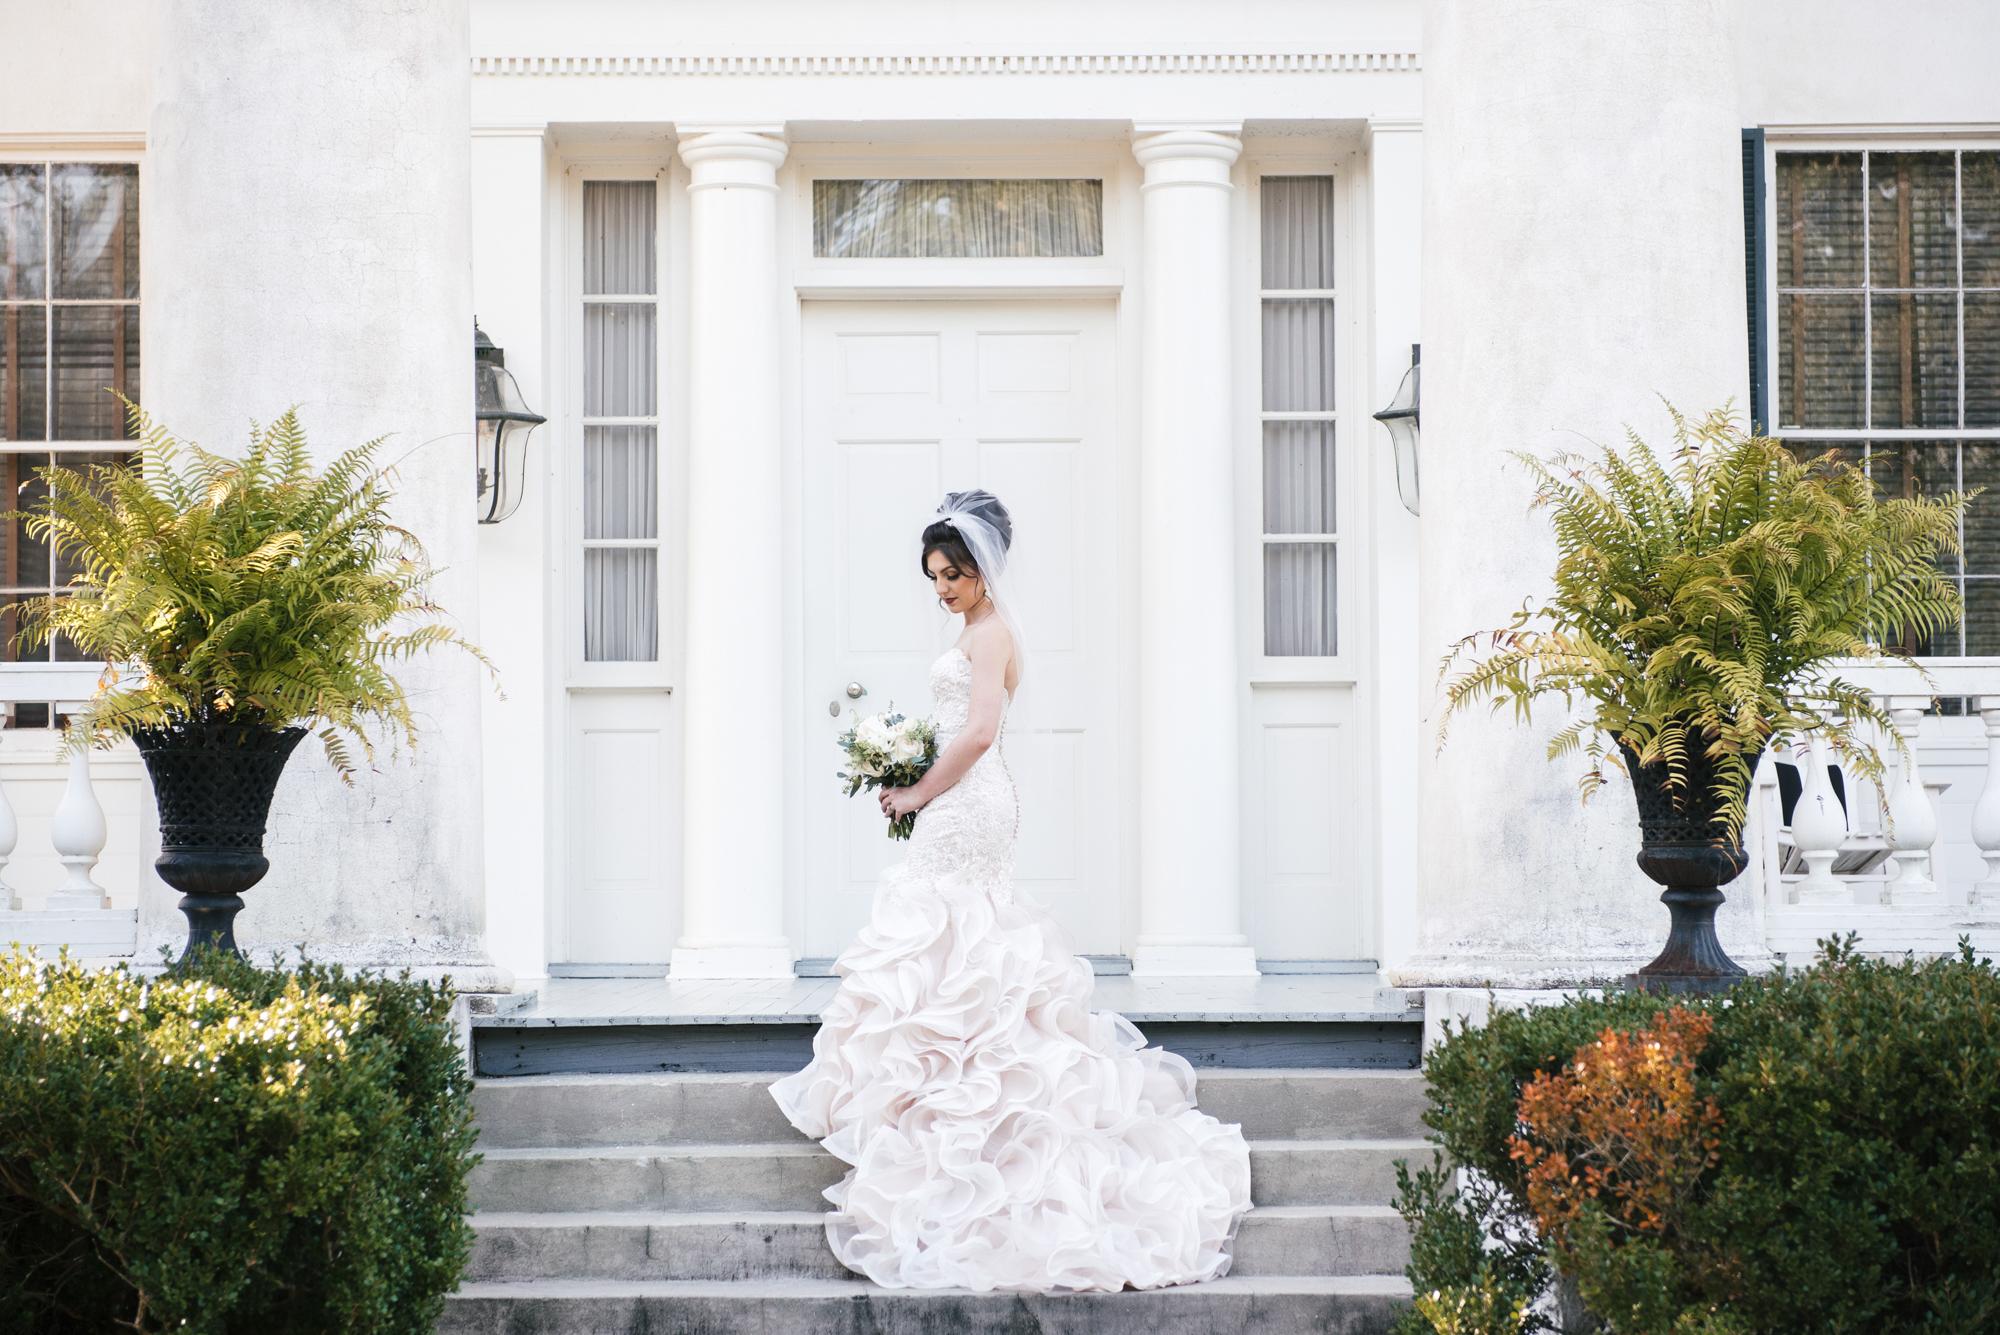 baton-rouge-wedding-photographer-4144.jpg